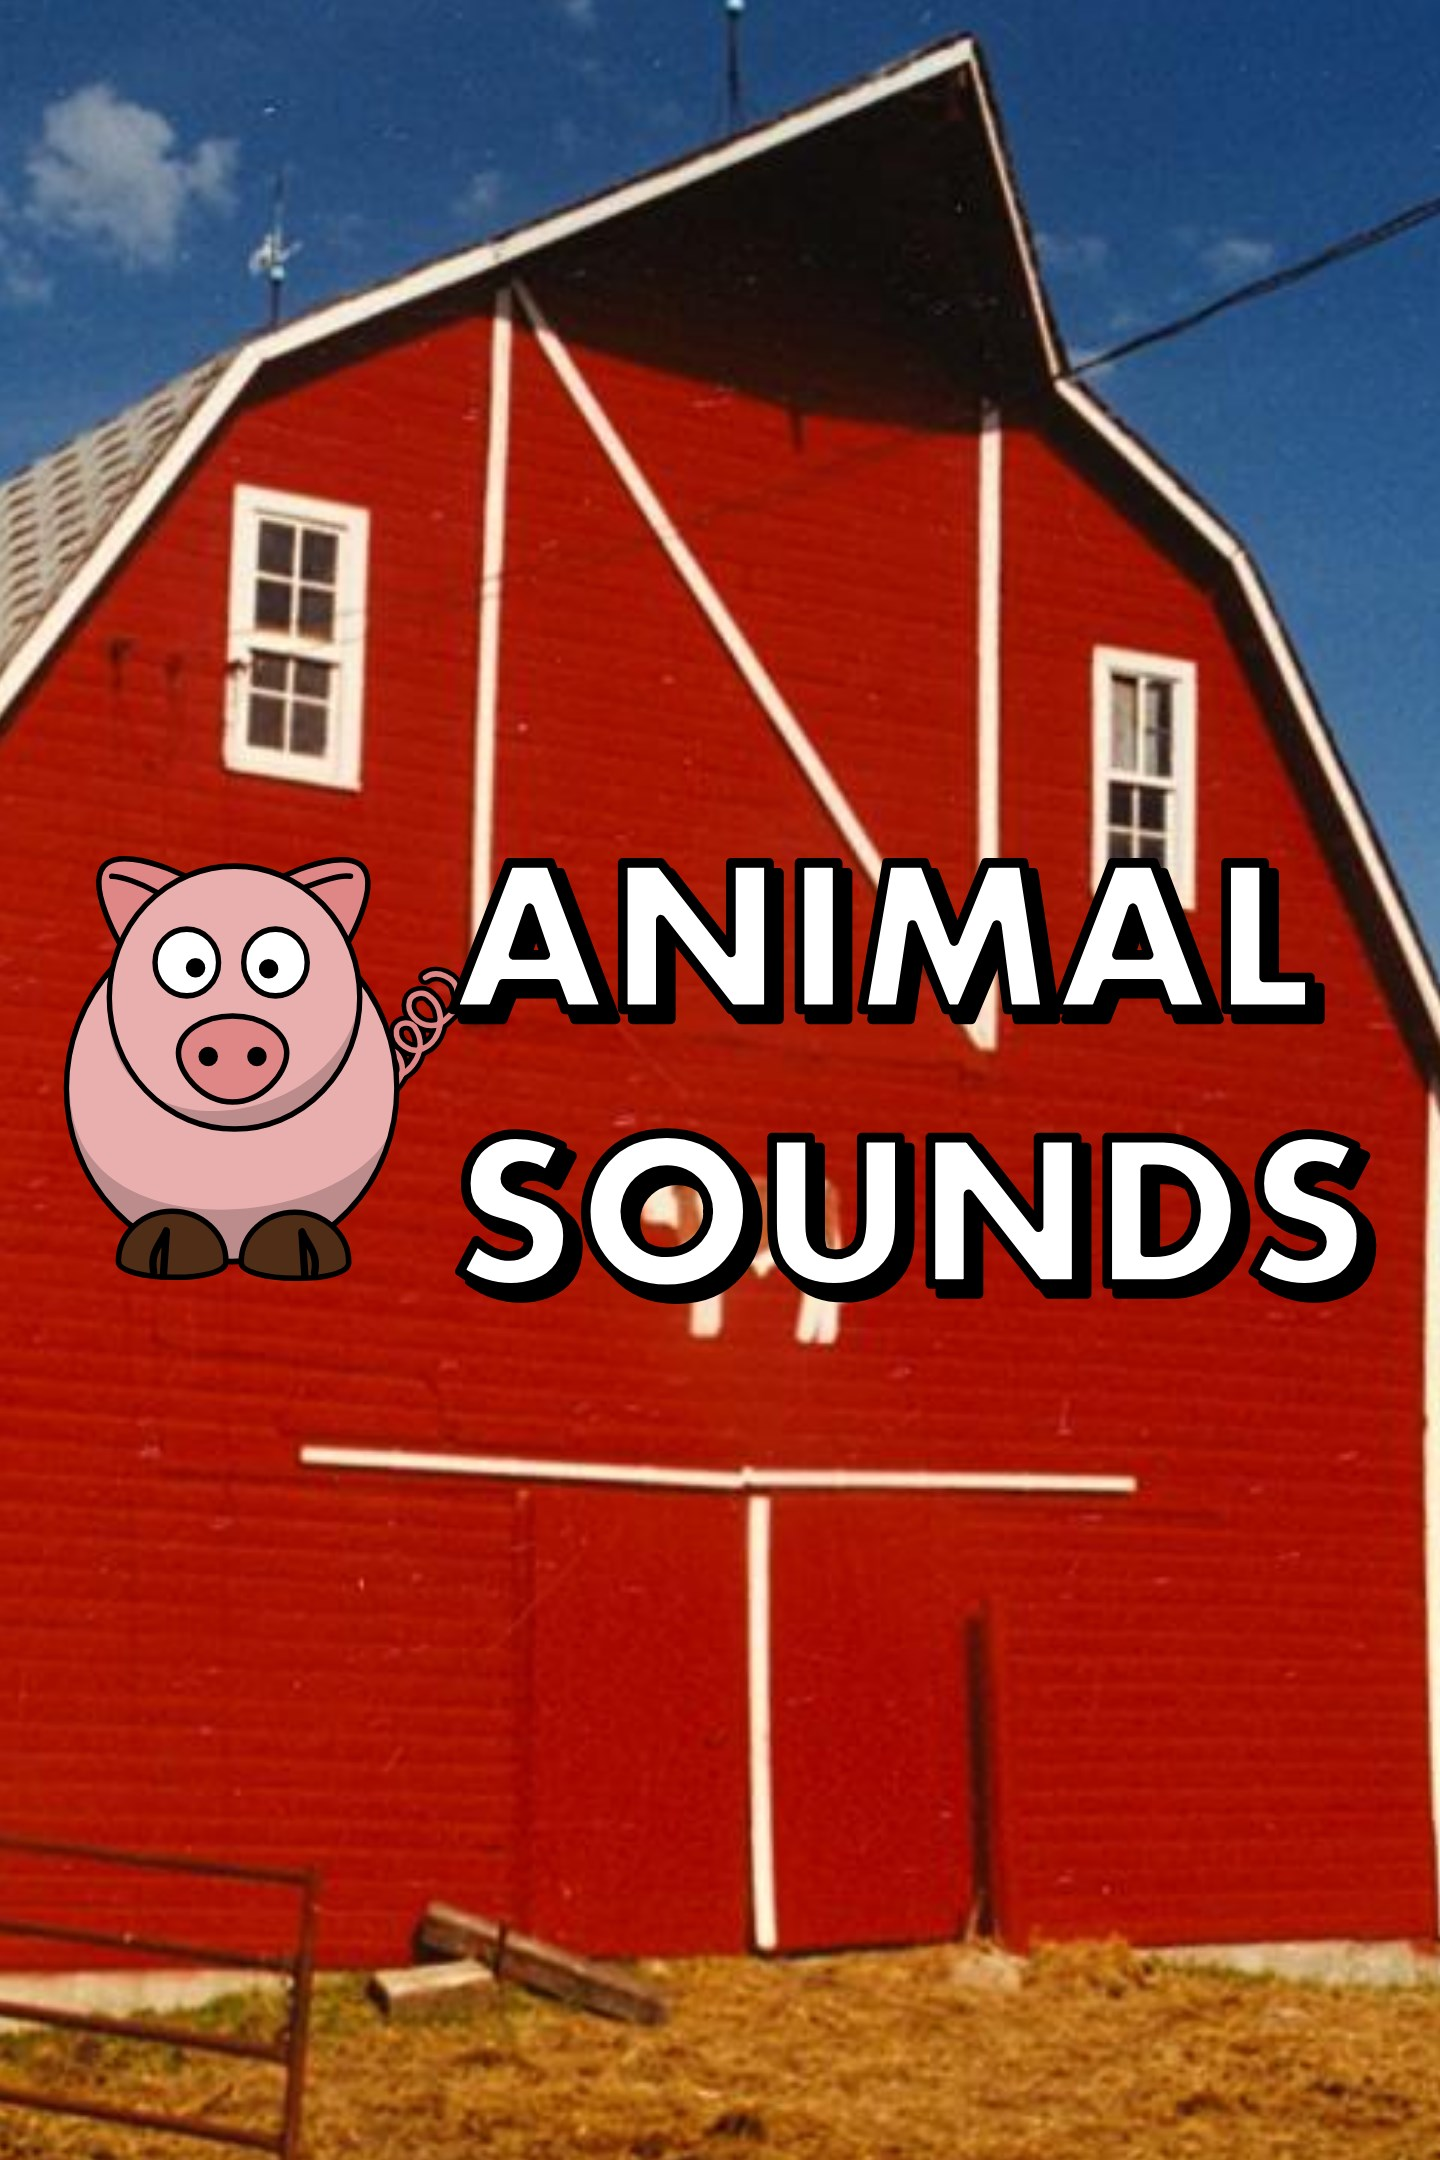 Animal Sounds Soundboard | FREE Windows Phone app market